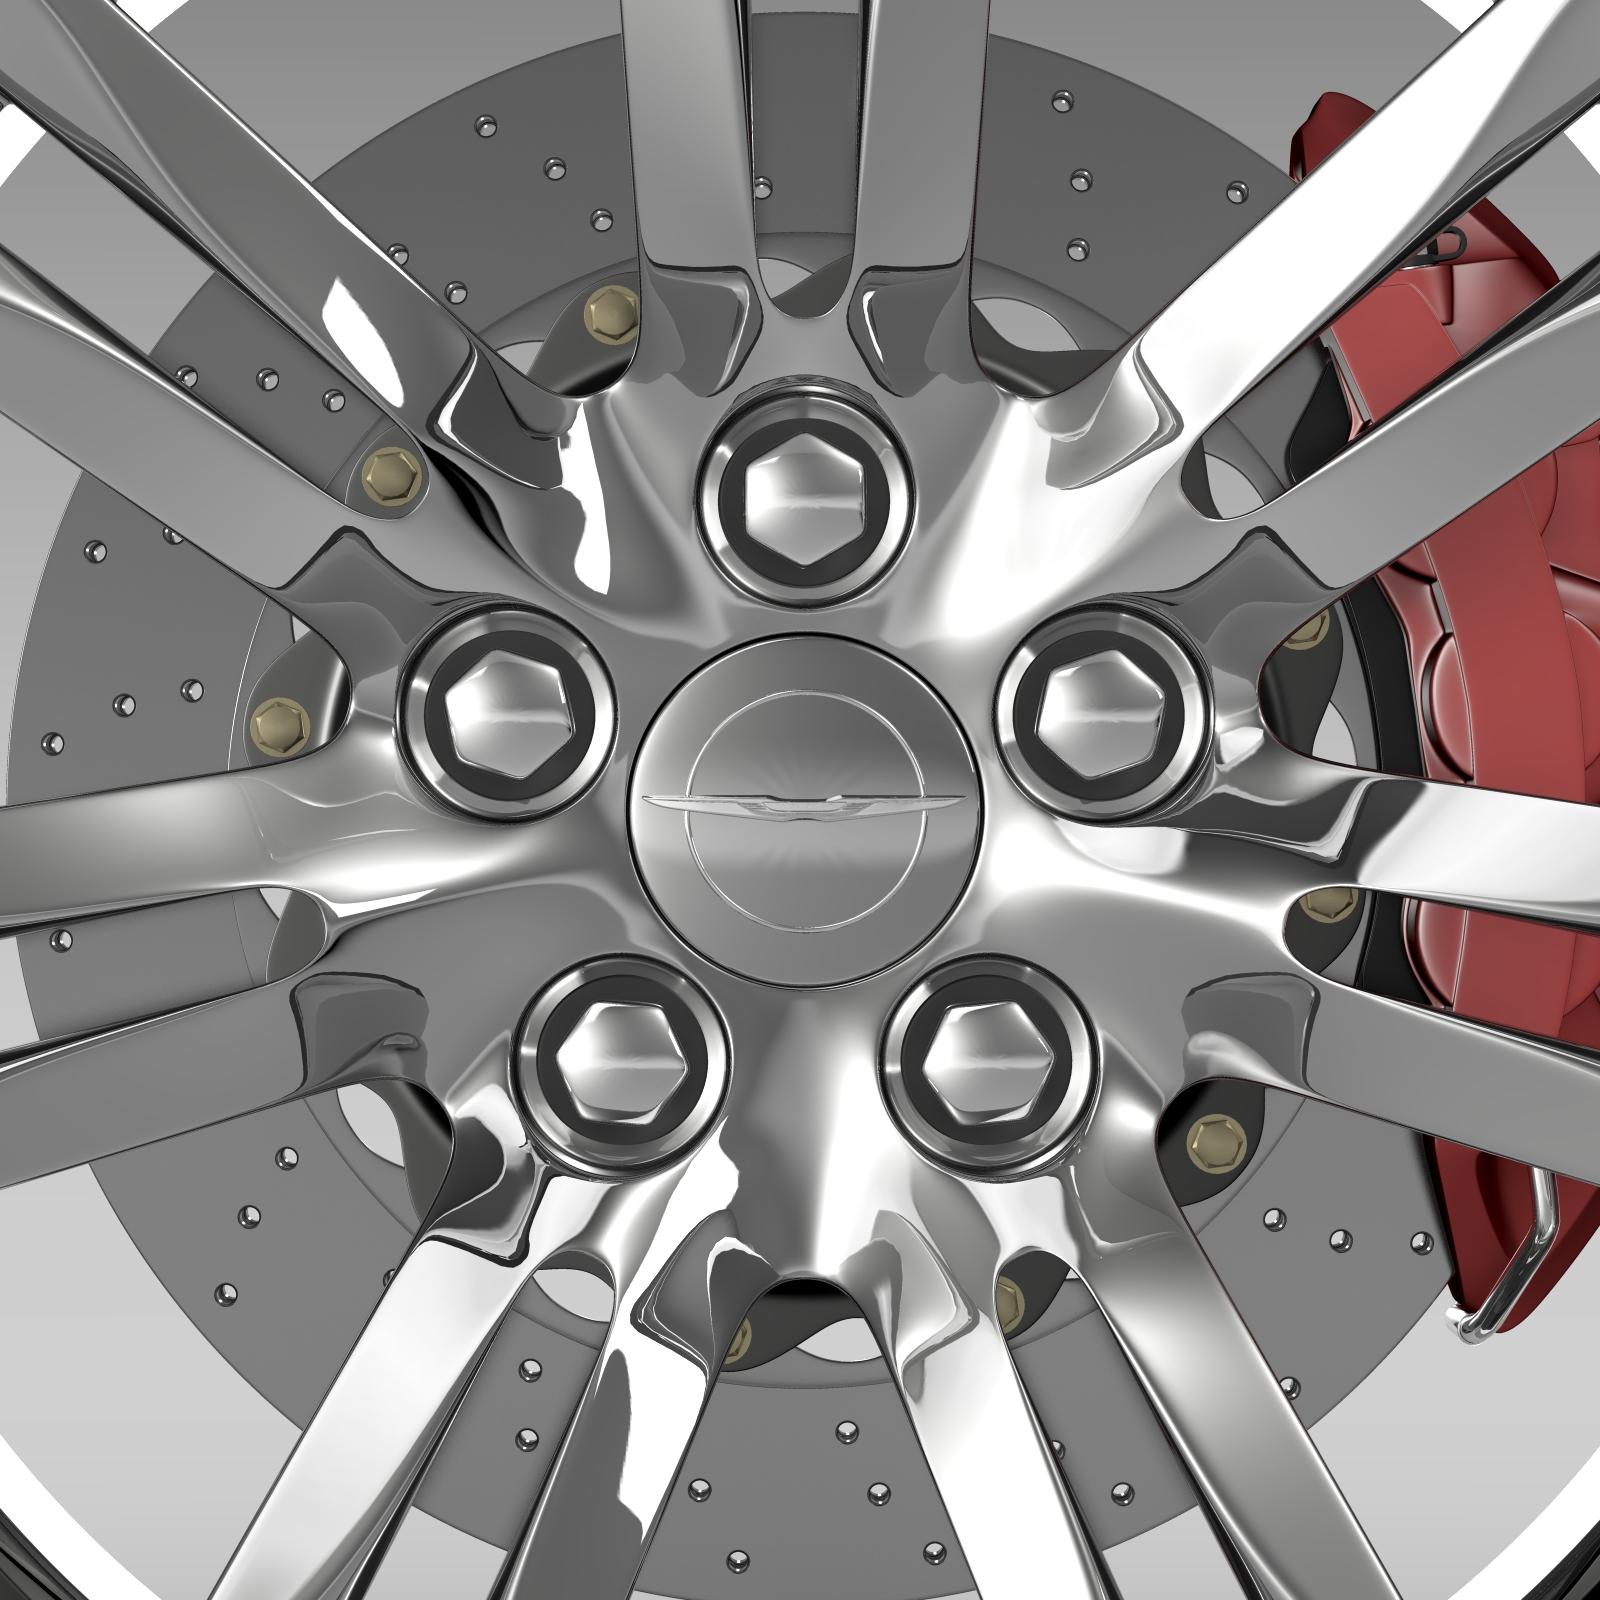 chrysler 300c 2015 wheel 3d model 3ds max fbx c4d lwo ma mb hrc xsi obj 212764